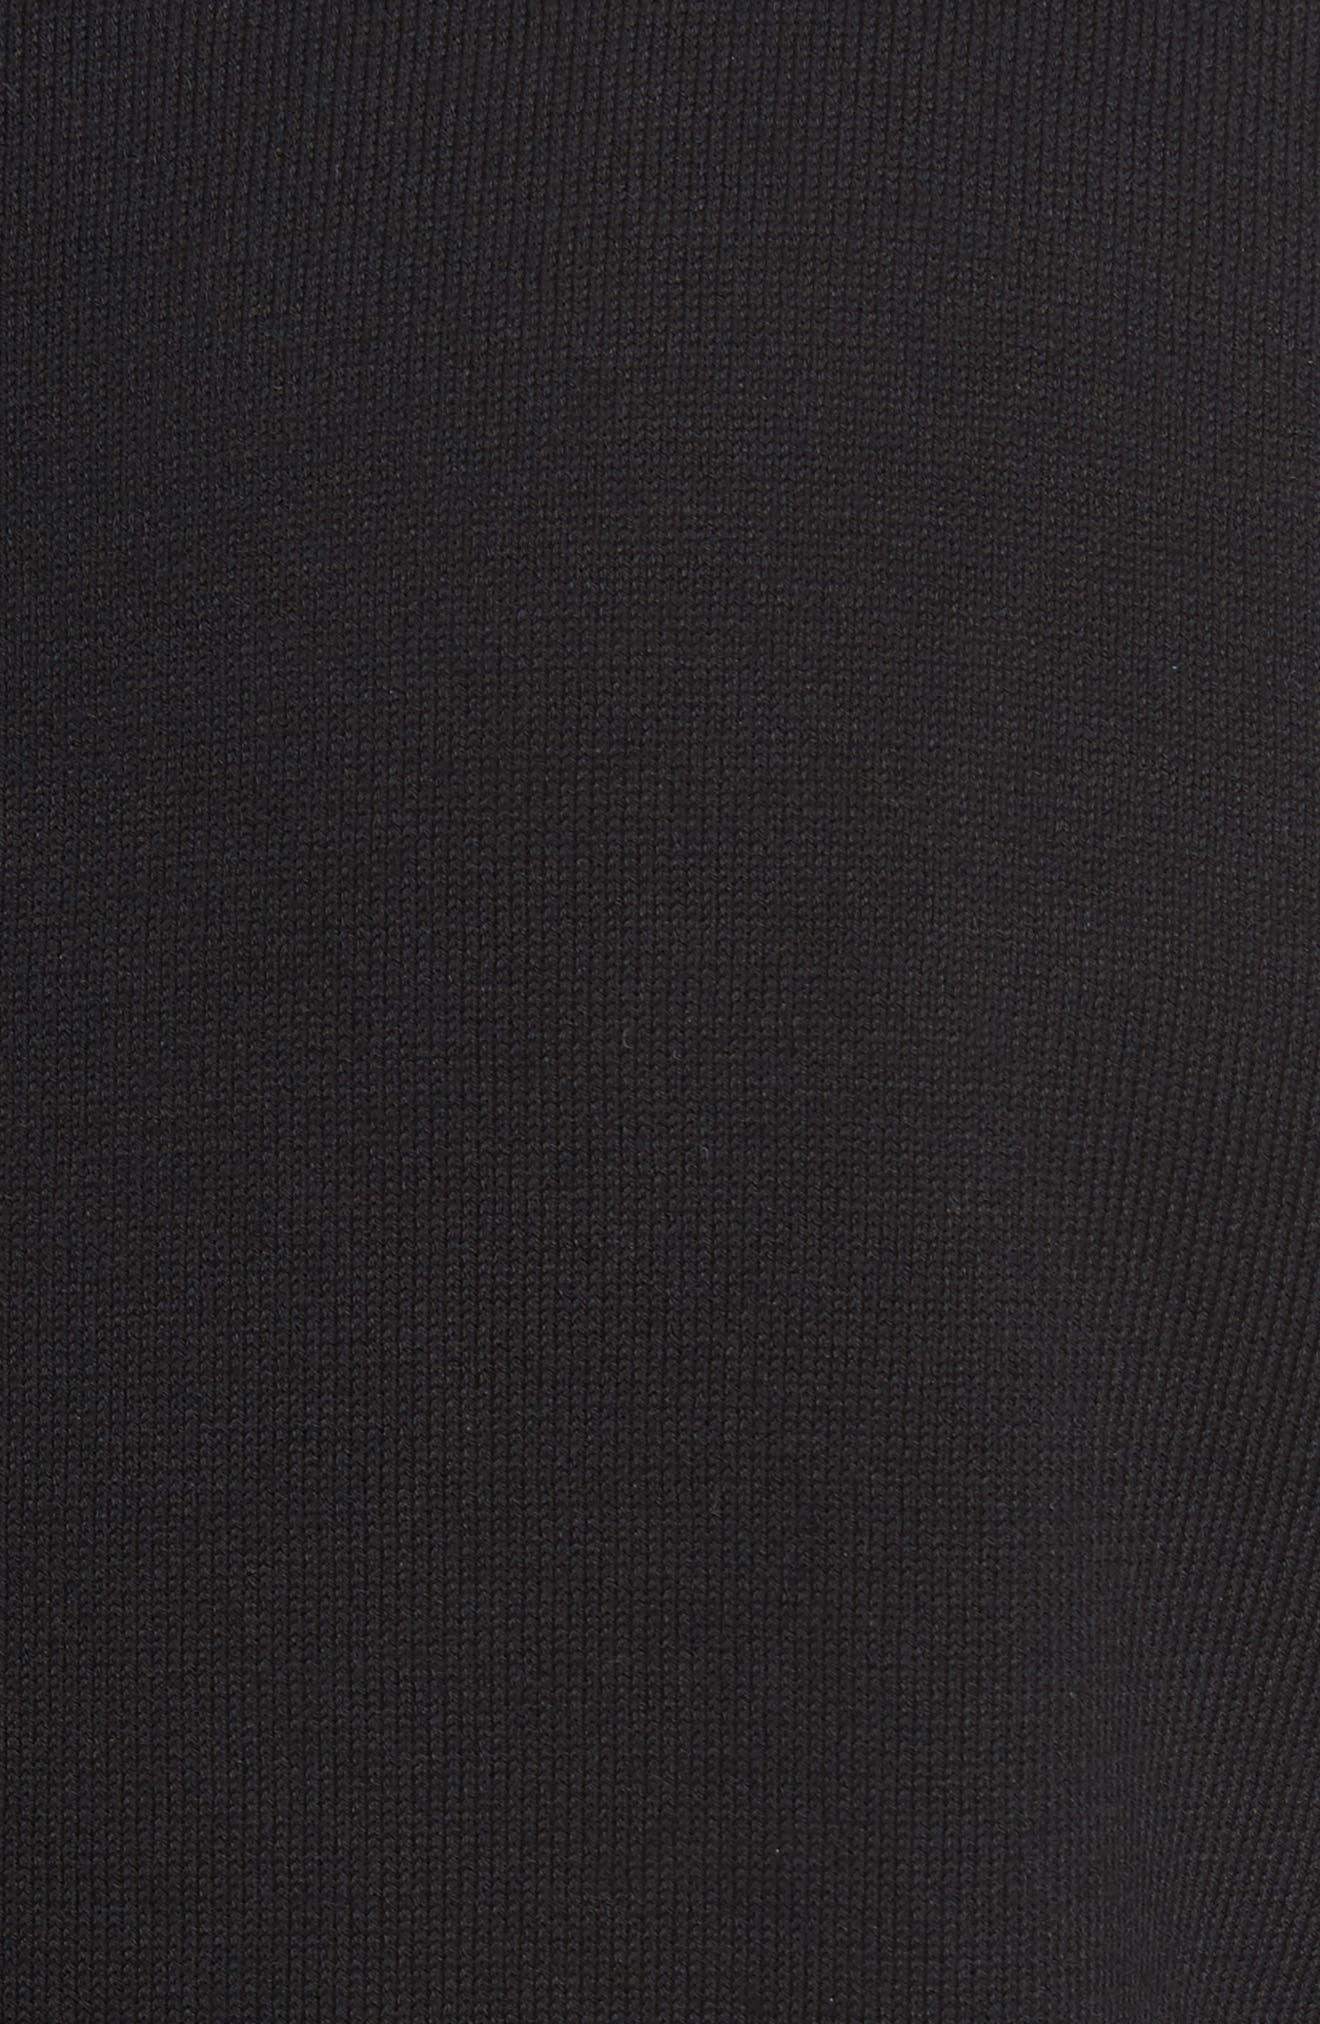 Star Crewneck Sweater,                             Alternate thumbnail 5, color,                             001